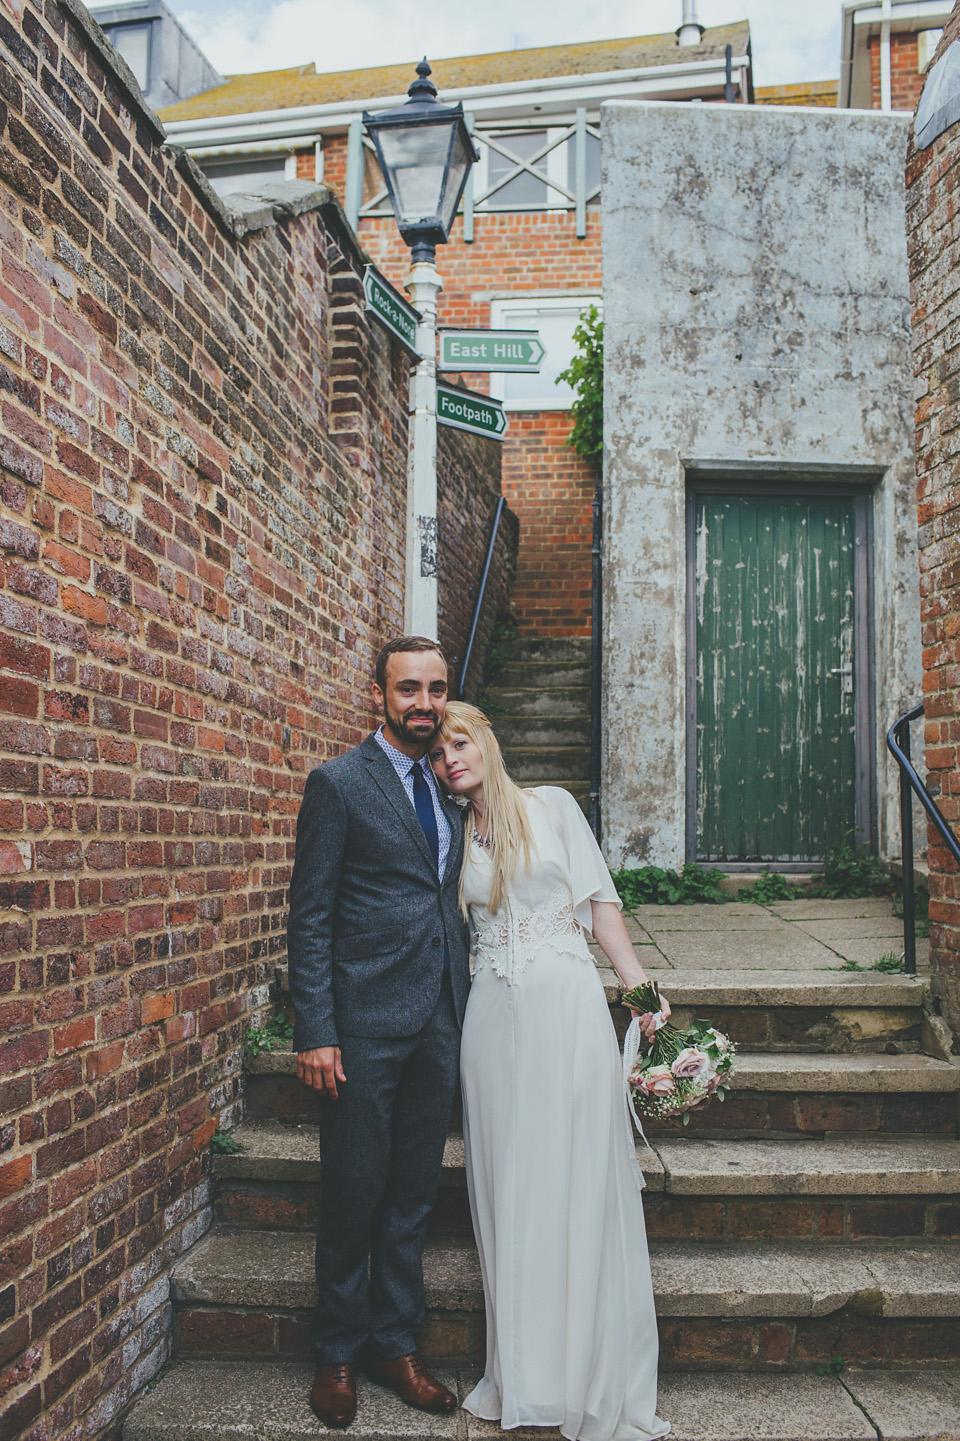 9473954bcd4 wpid ASOS wedding dress - An ASOS Wedding Dress for a Boho Bride and her